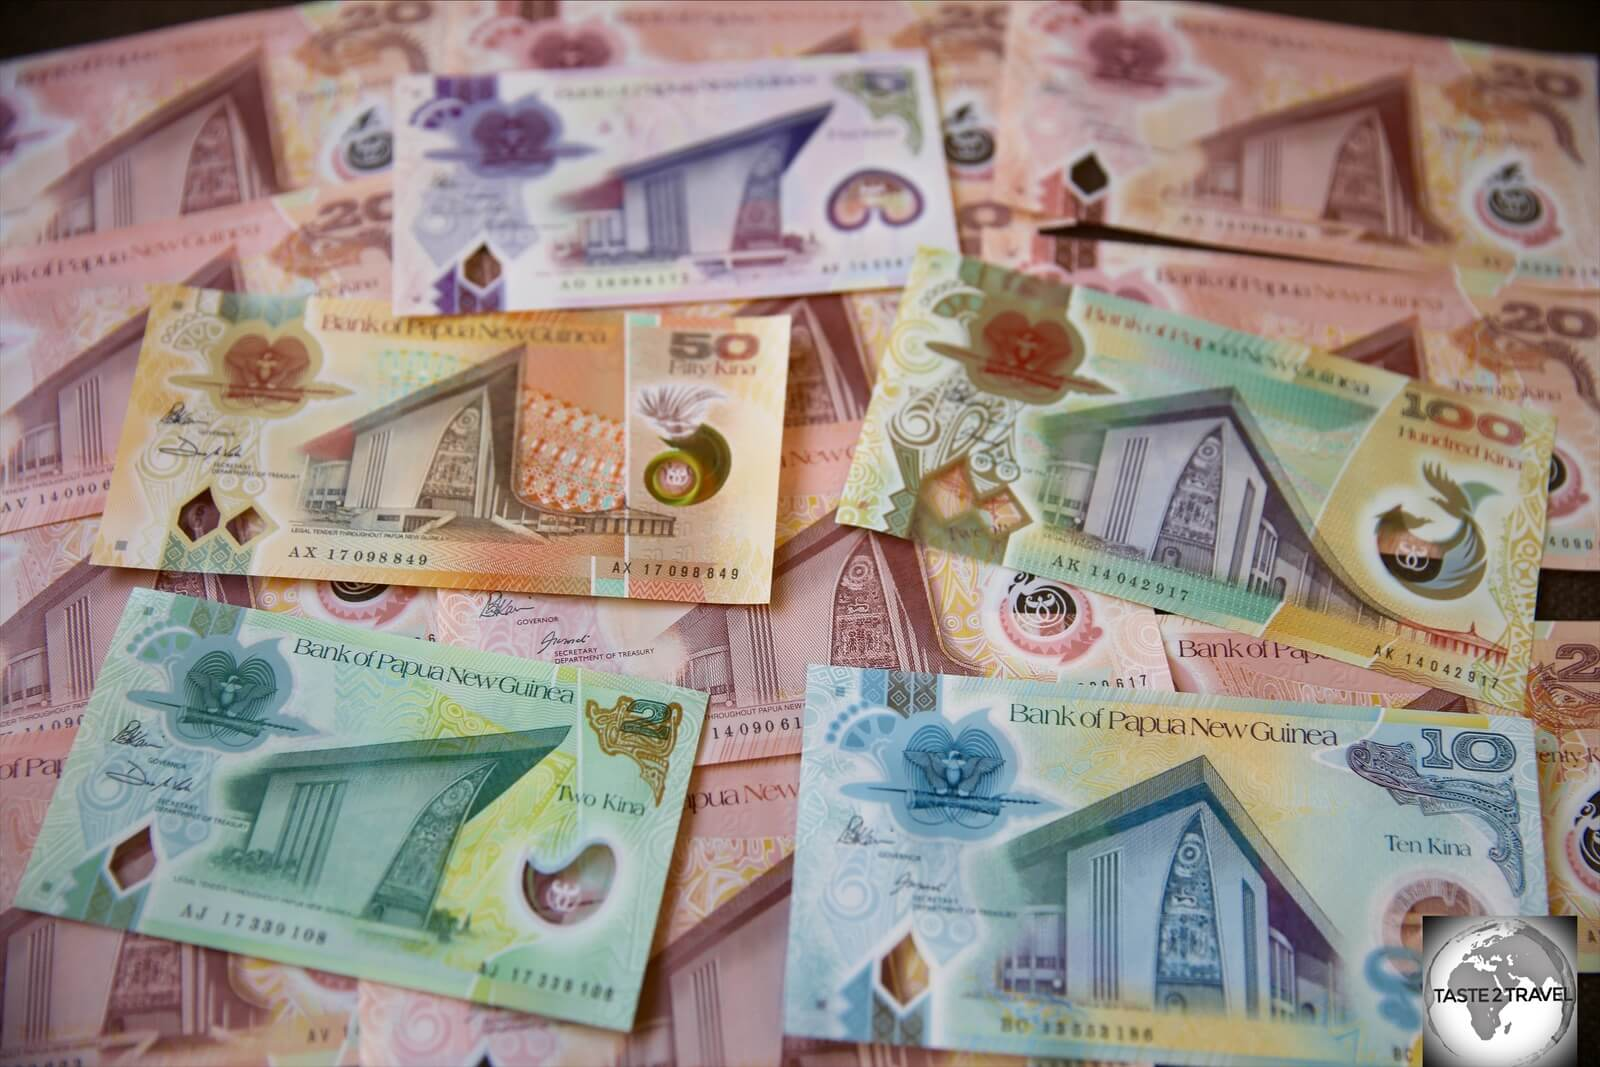 Currency: Papua New Guinea Kina